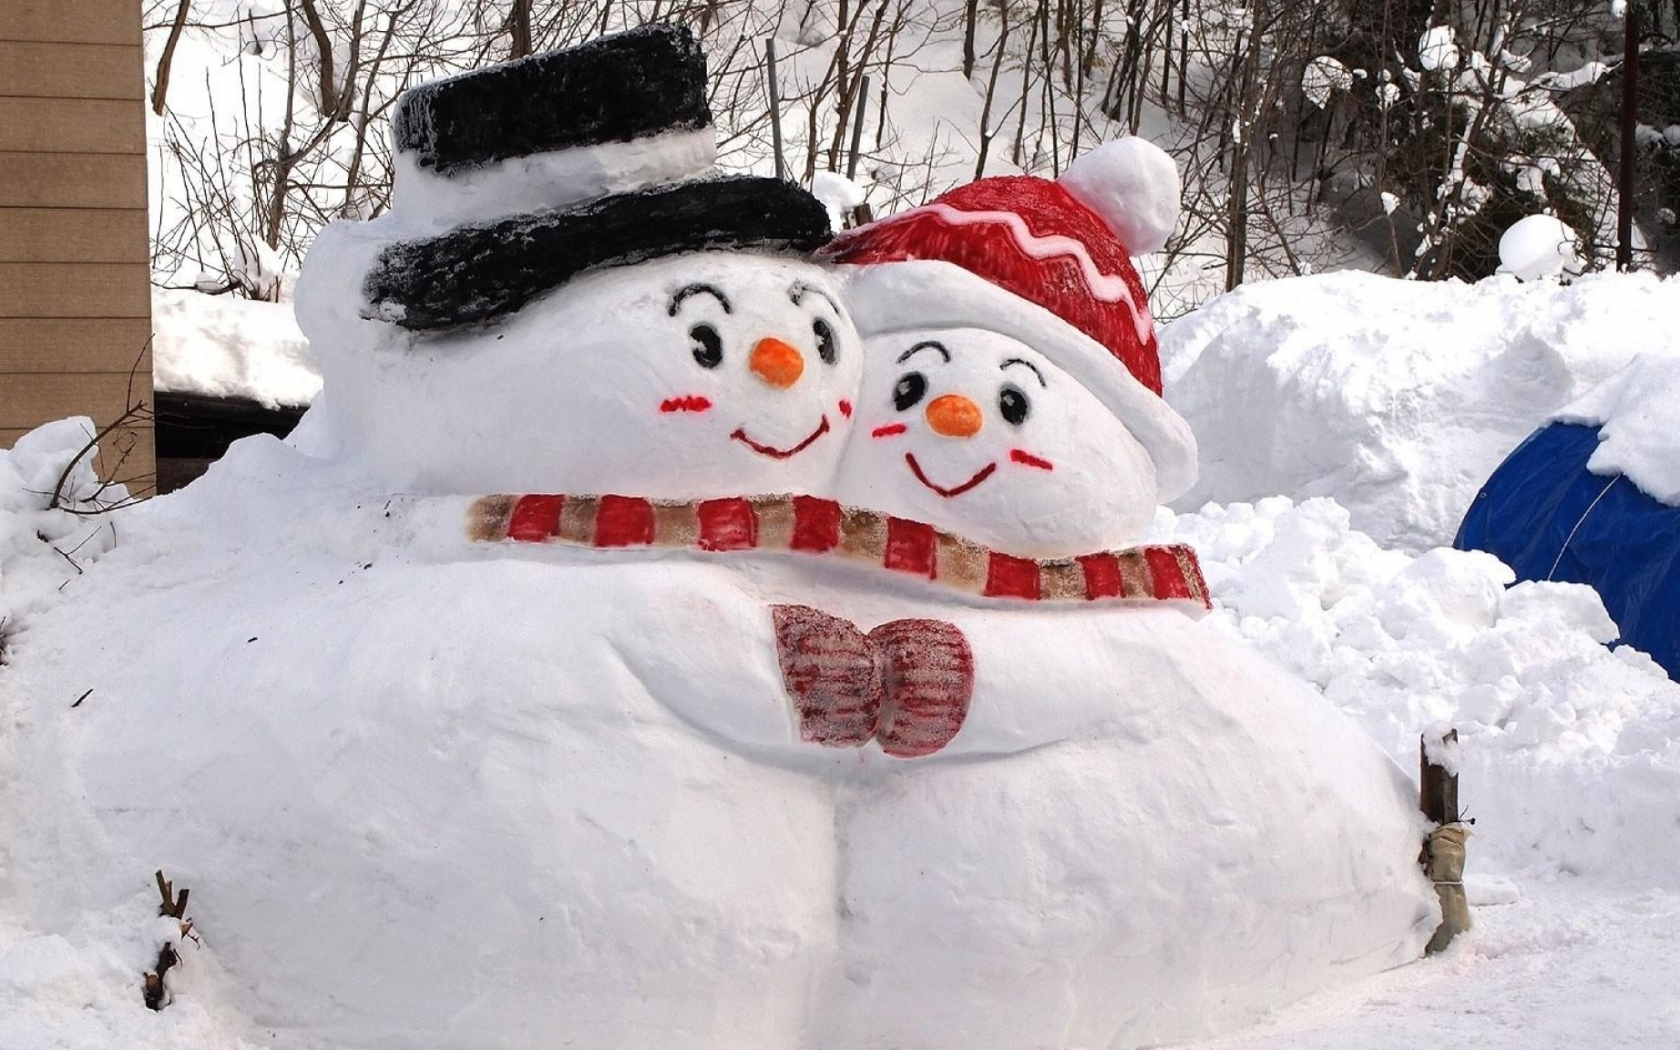 download 2048x1152 snowmen snow winter 2048x1152 Resolution 1680x1050